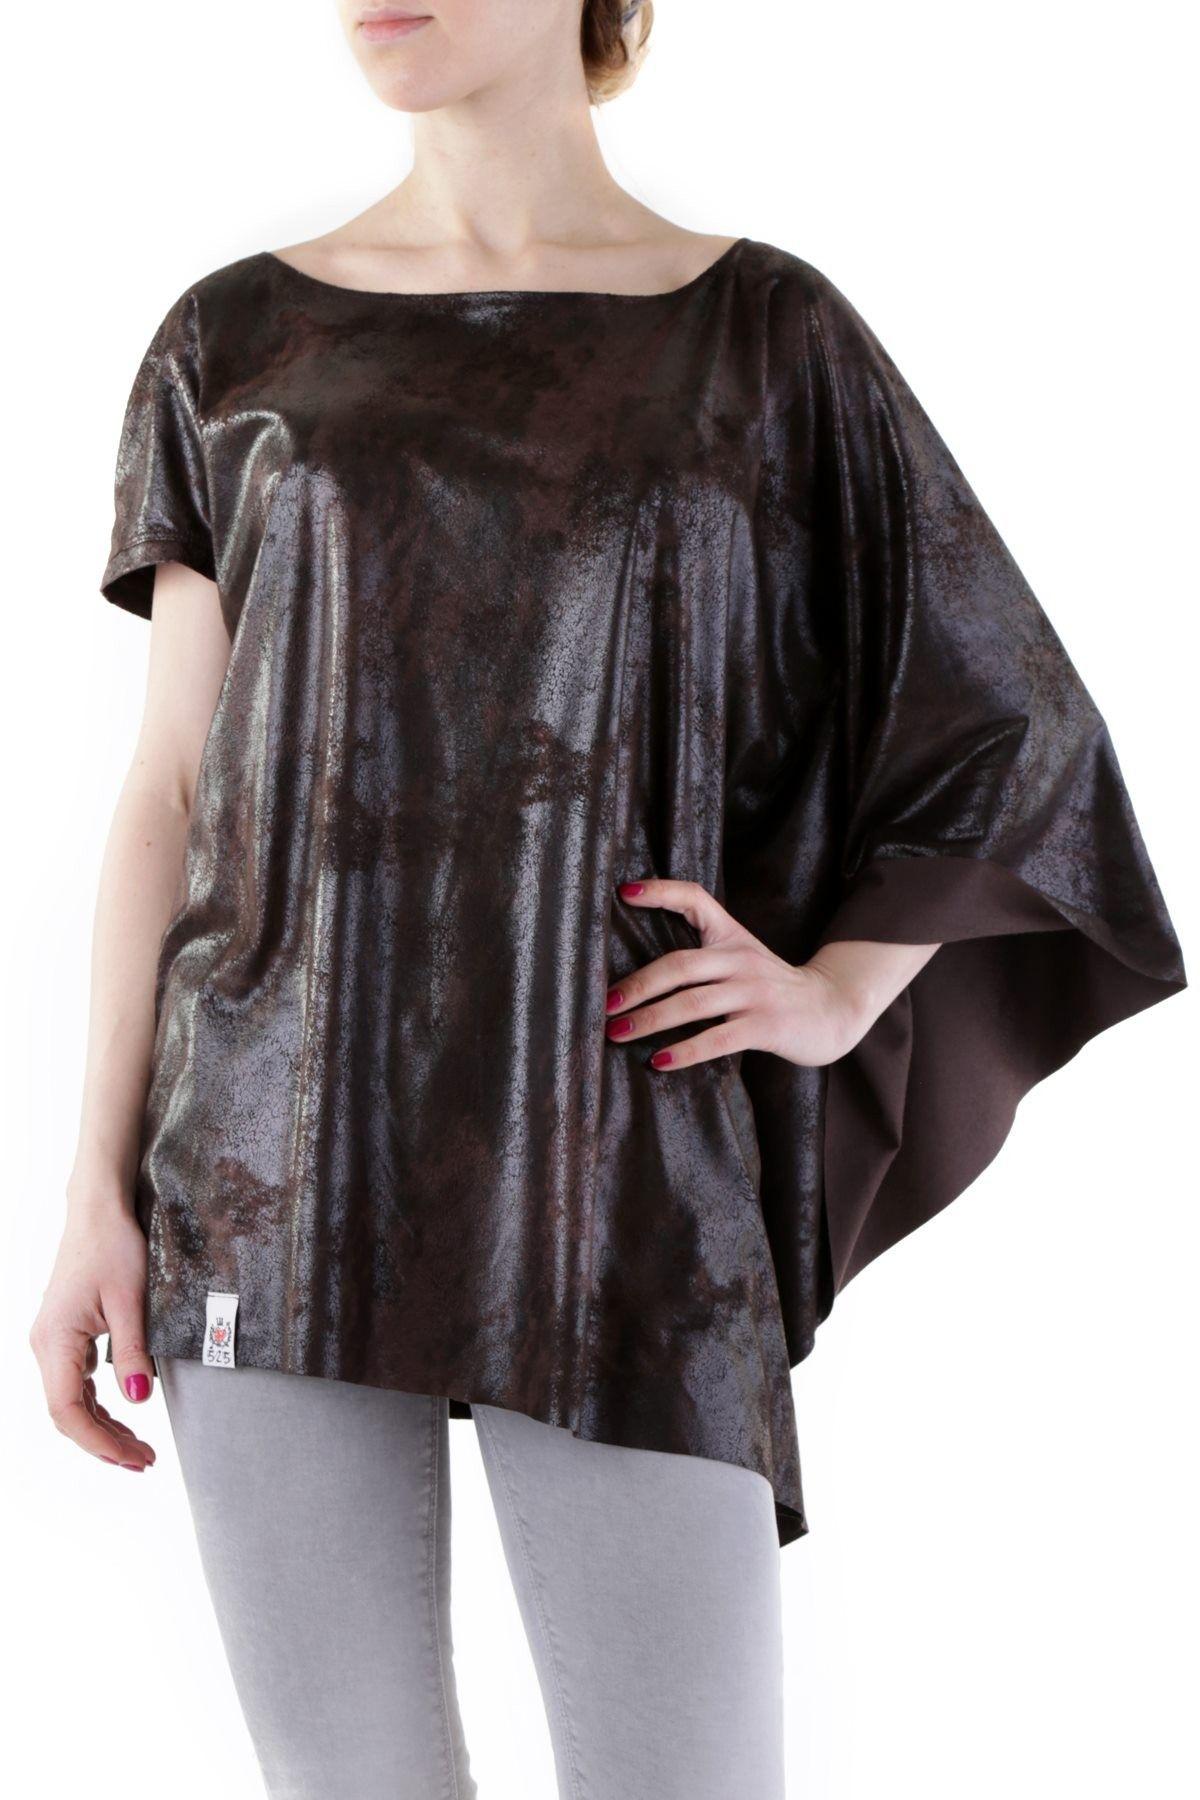 525 Women's Blouse In Brown